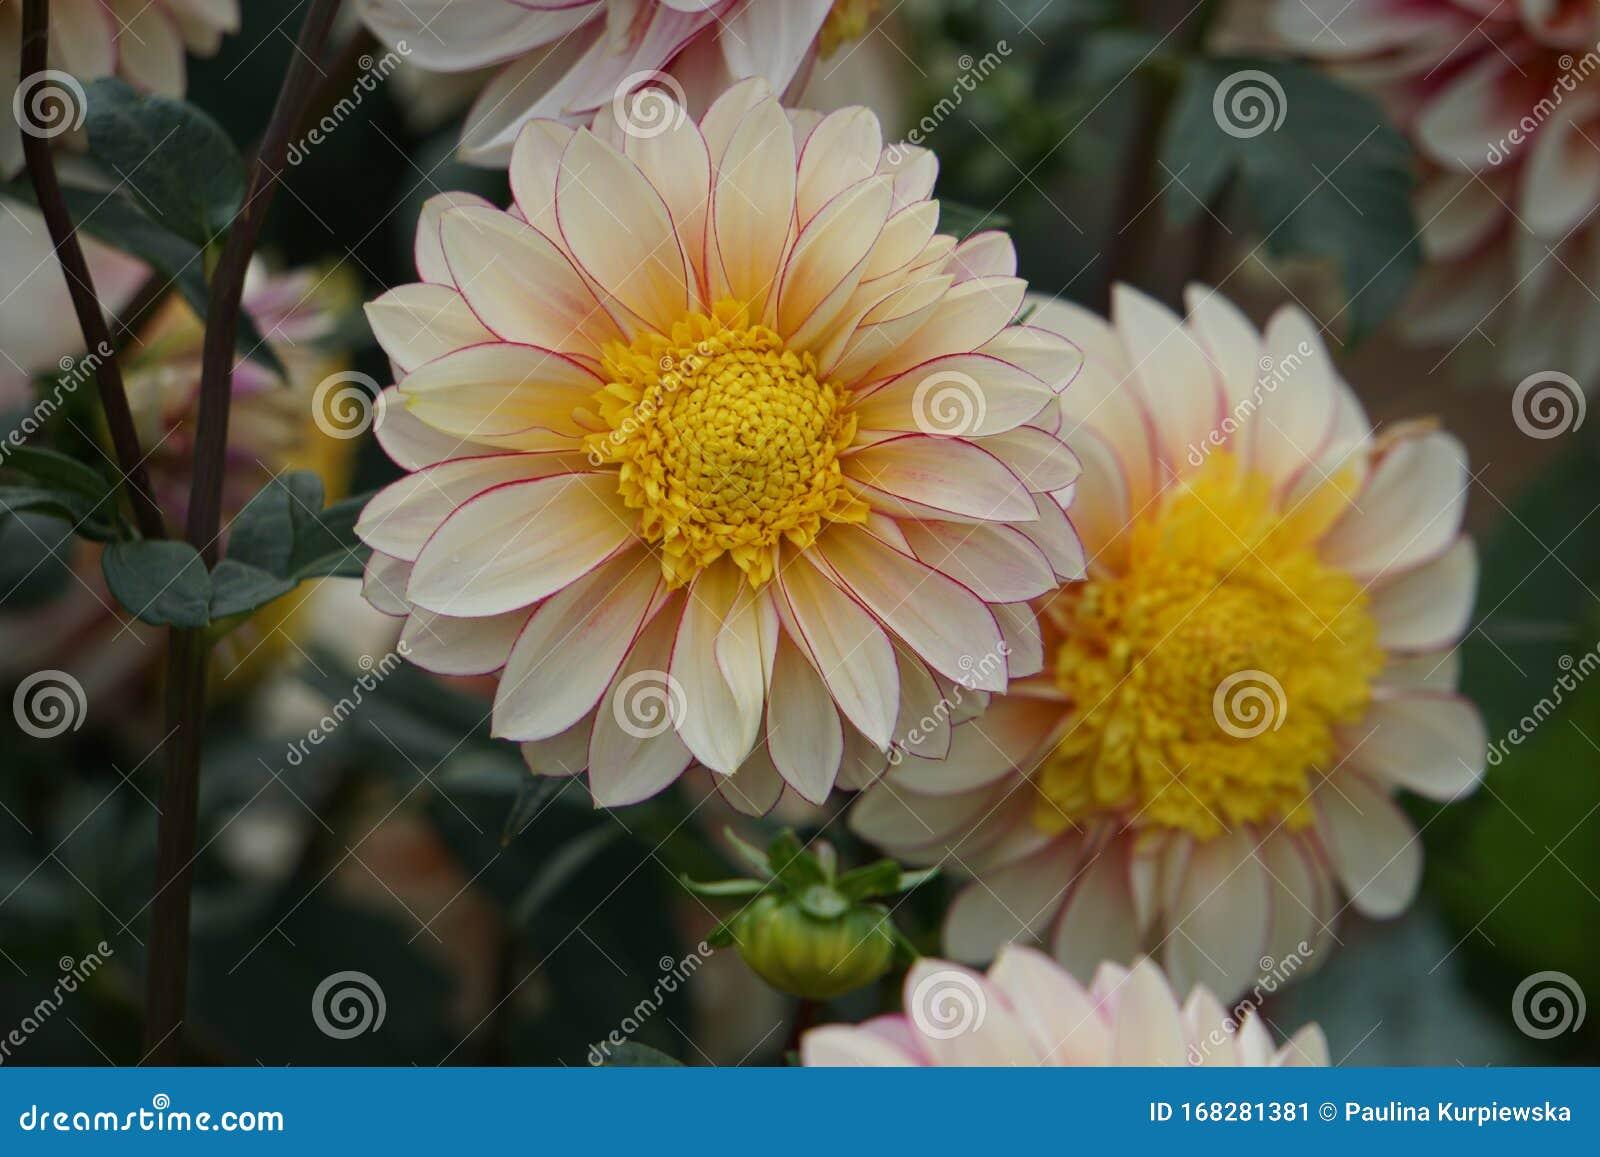 Dahlia Polka Anemone Like Flowers Peach Coral Blooms Stock Image